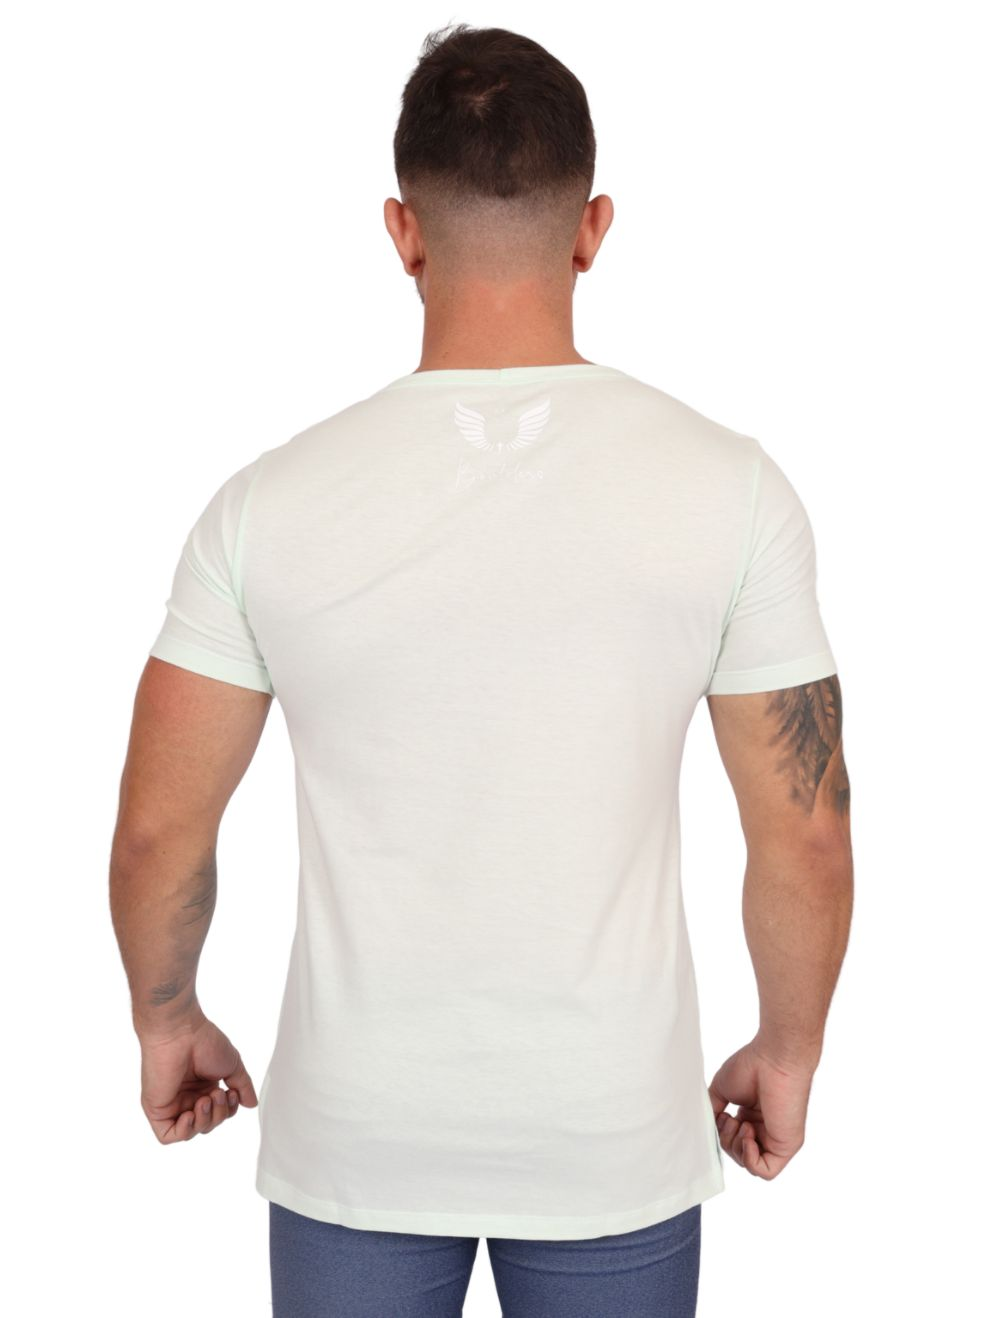 Camiseta Masculina Manga Curta Verde Since 2017